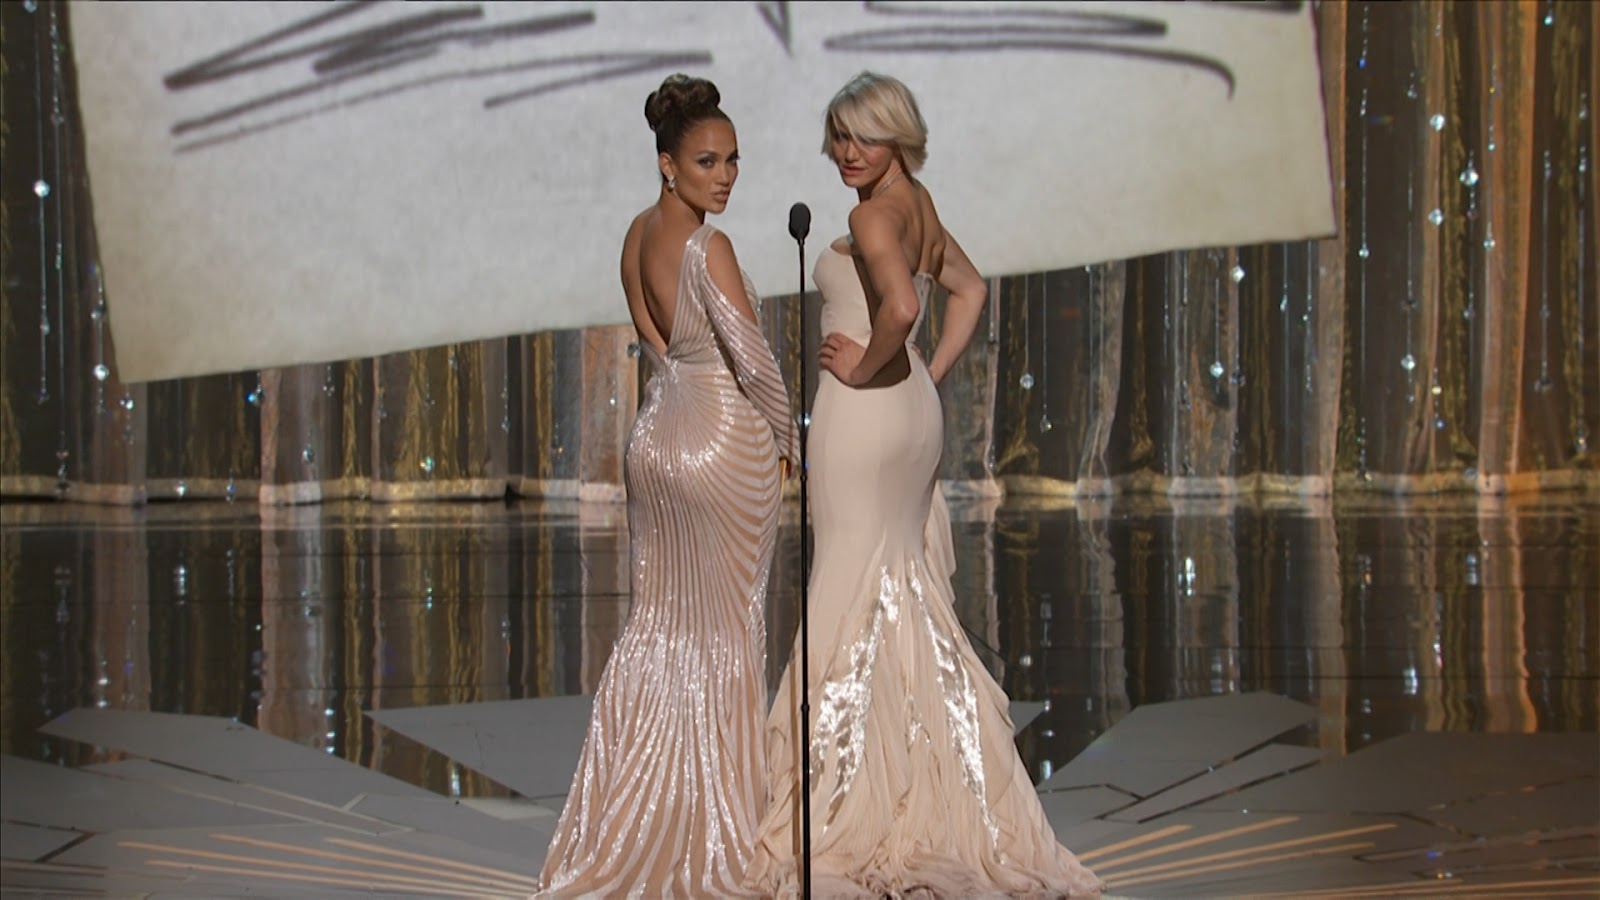 http://2.bp.blogspot.com/-YlJ-DJBfD4A/T1svDQILAuI/AAAAAAAAAi4/QKBkai_bp6I/s1600/Jennifer_Lopez_-_Cameron_Diaz_Oscars_2012_1080i+-+Kopie.mpg.Standbild010.jpg